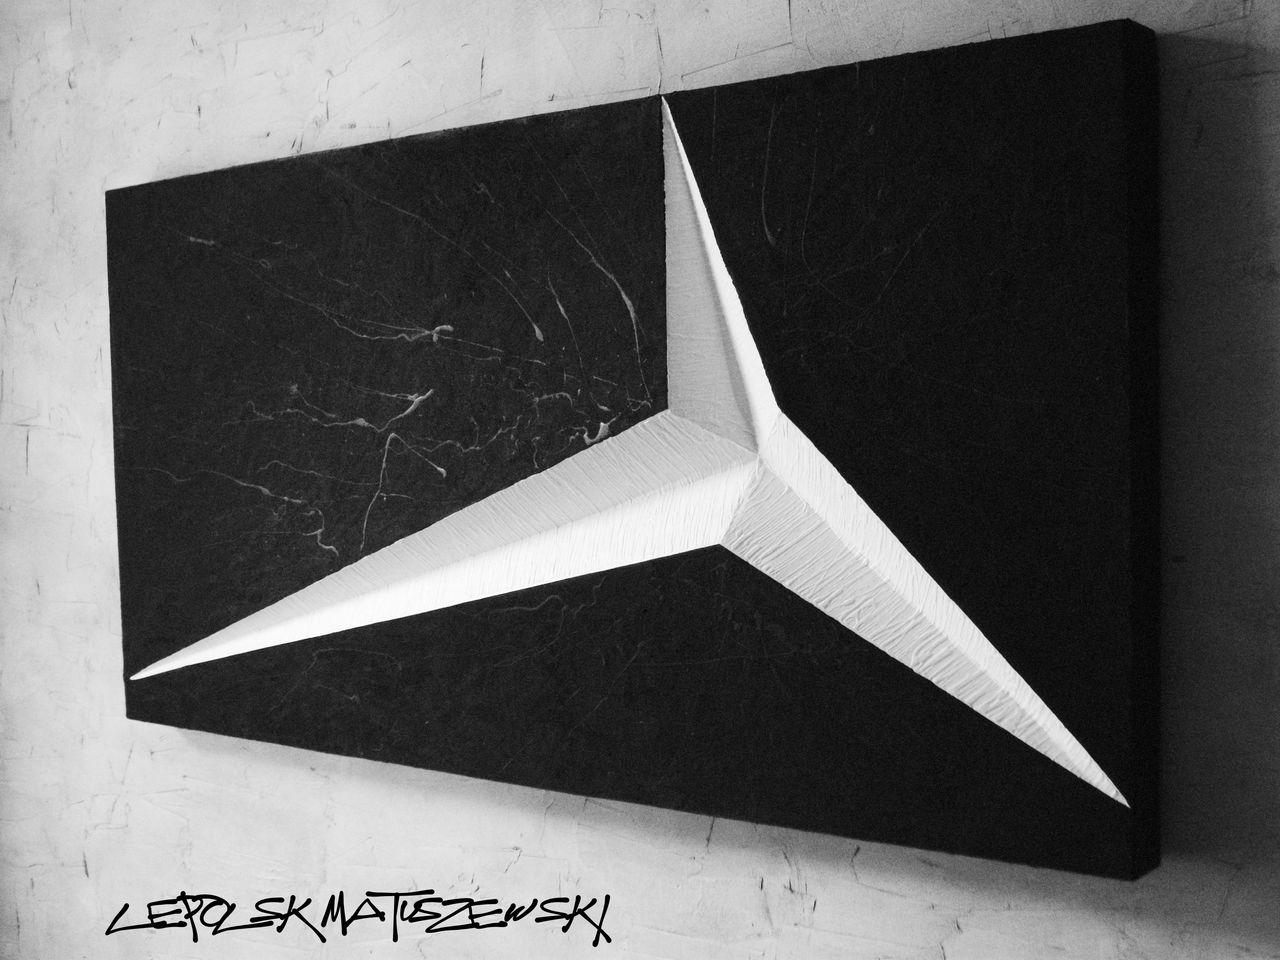 MISTER K  (Lepolsk Matuszewski) PROTOTYPE 115 expressionnisme abstrait